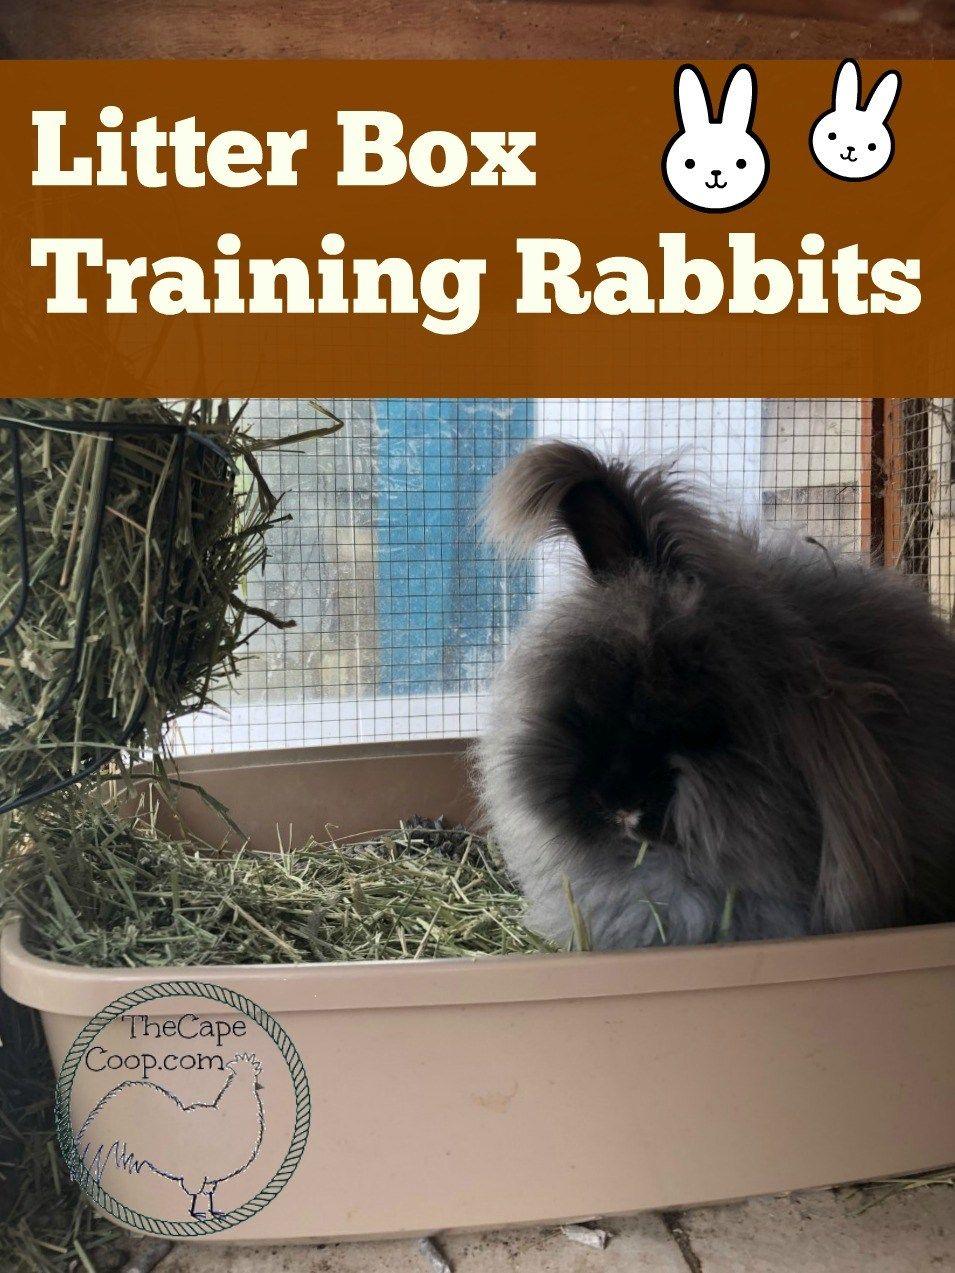 Litter Box Training Rabbits Litter box training rabbits